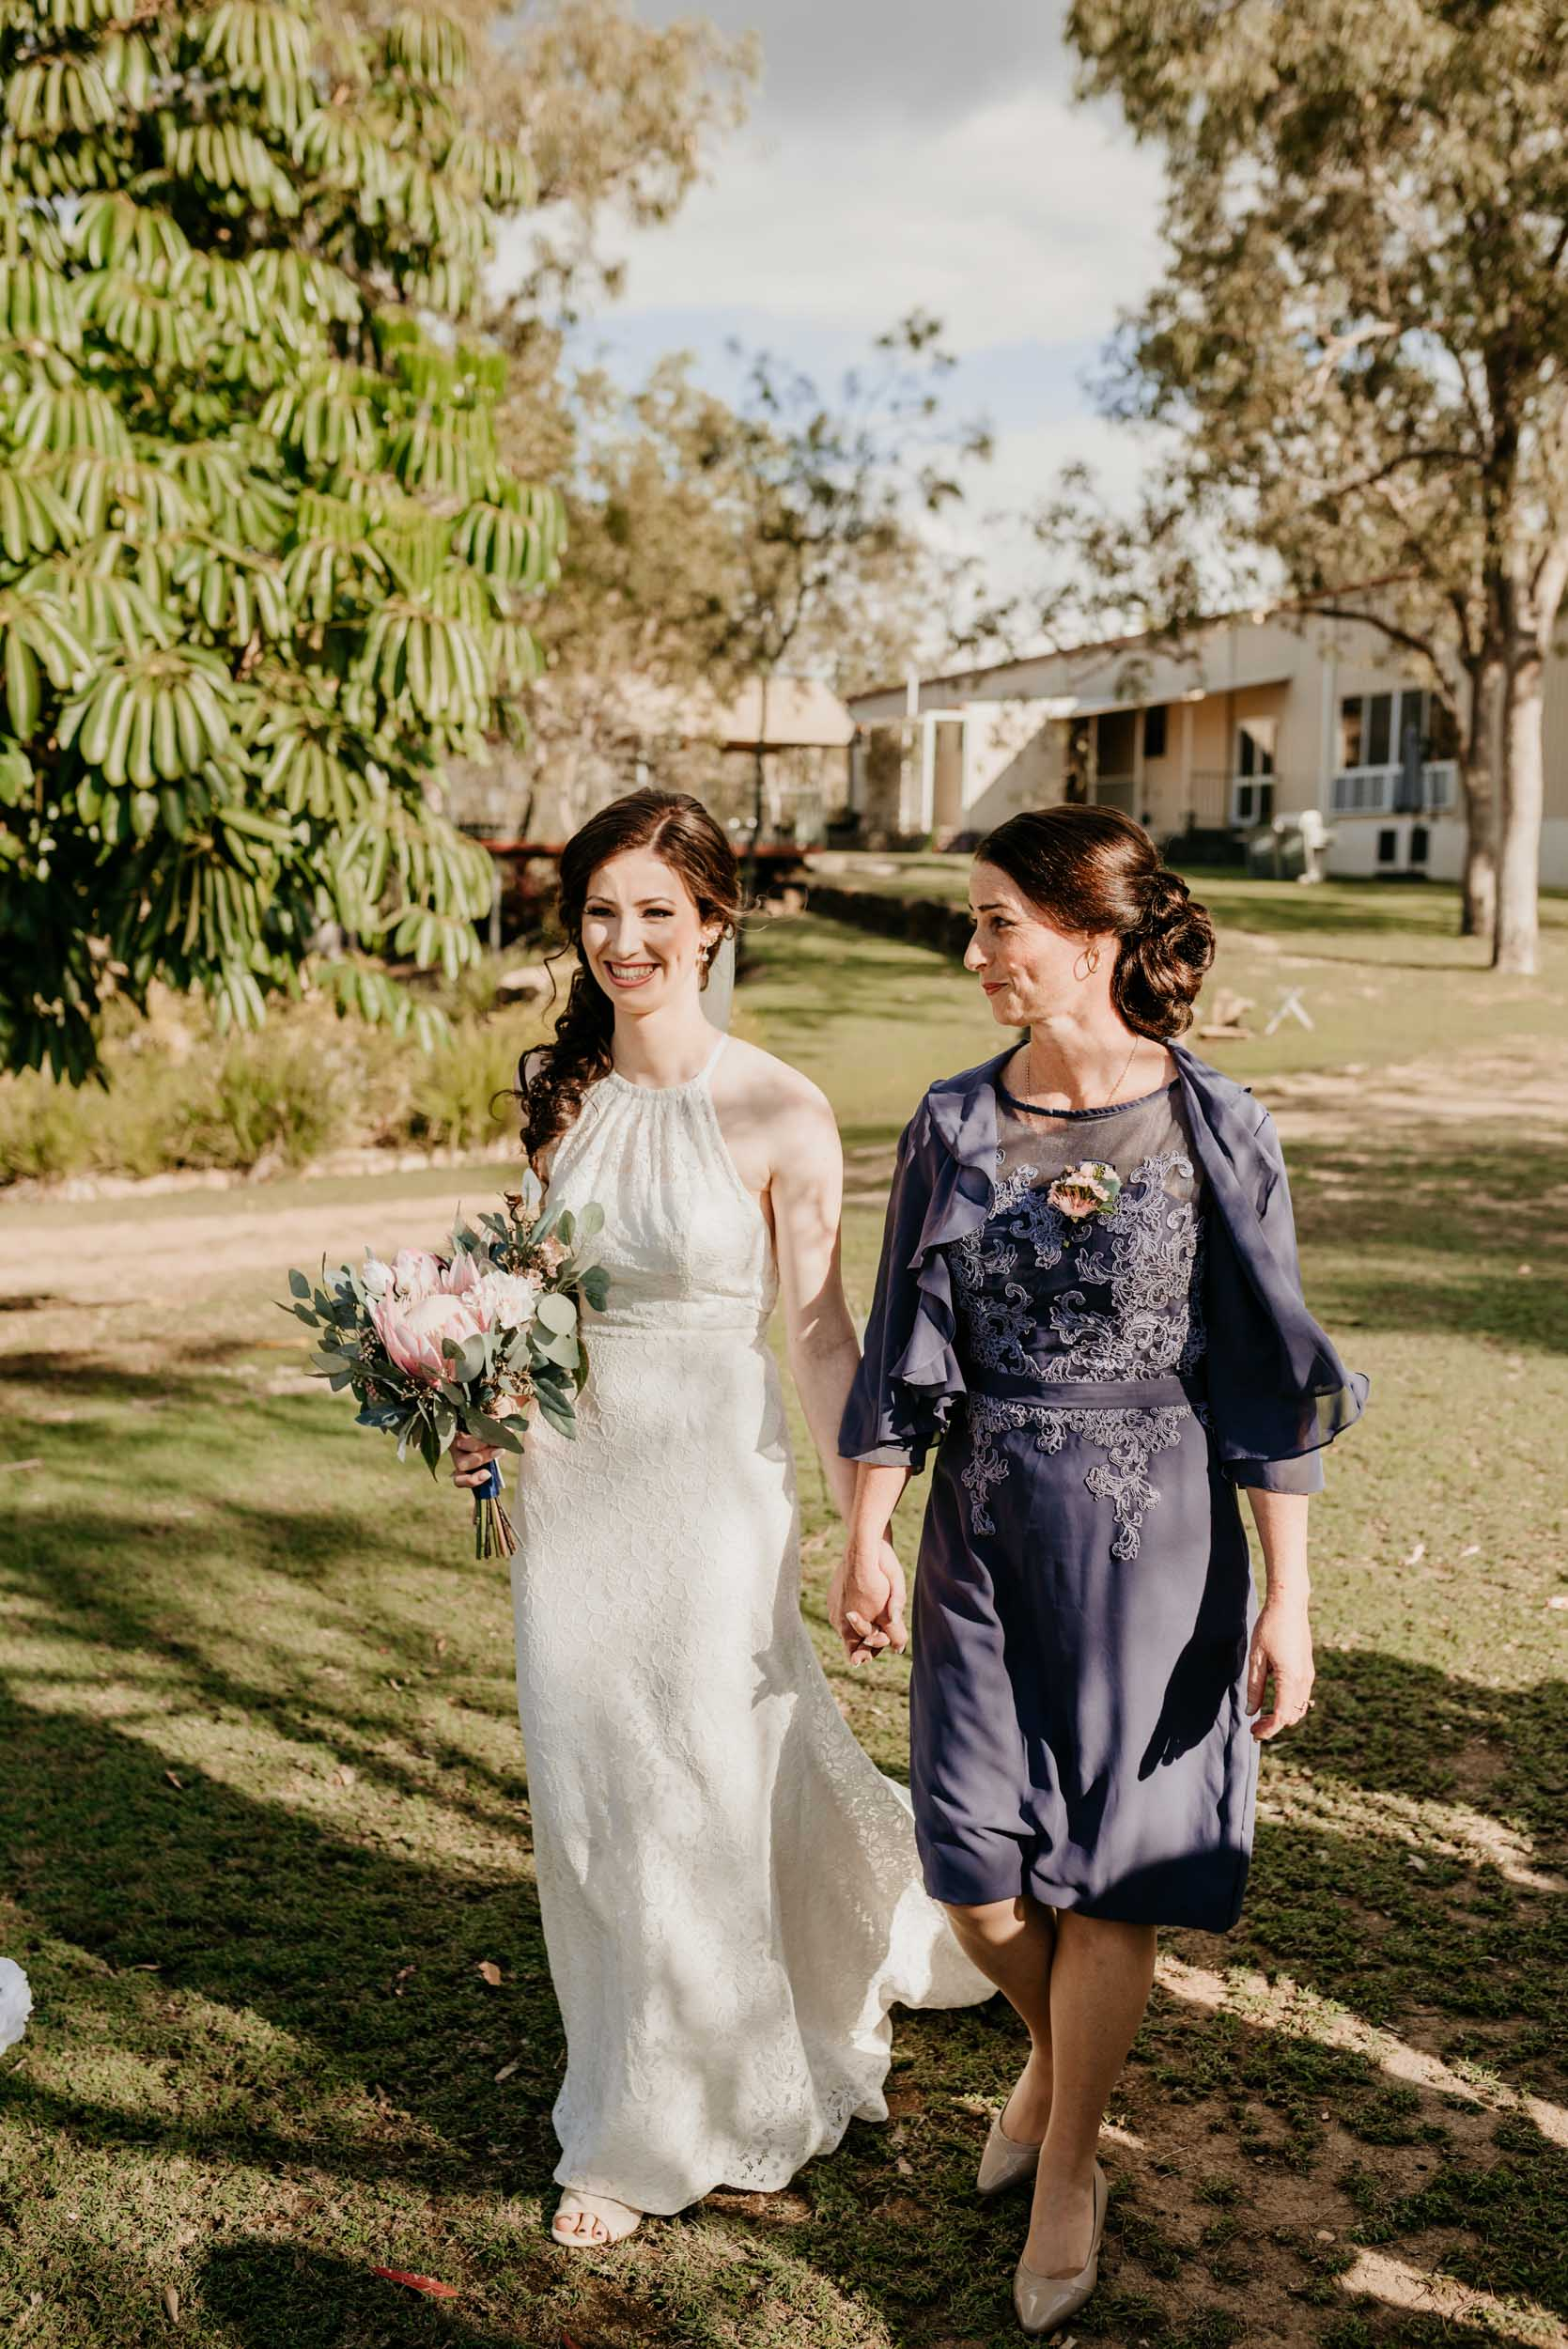 The Raw Photographer - Cairns Wedding Photographer - Atherton Tablelands Venue - Mareeba Photography-28.jpg